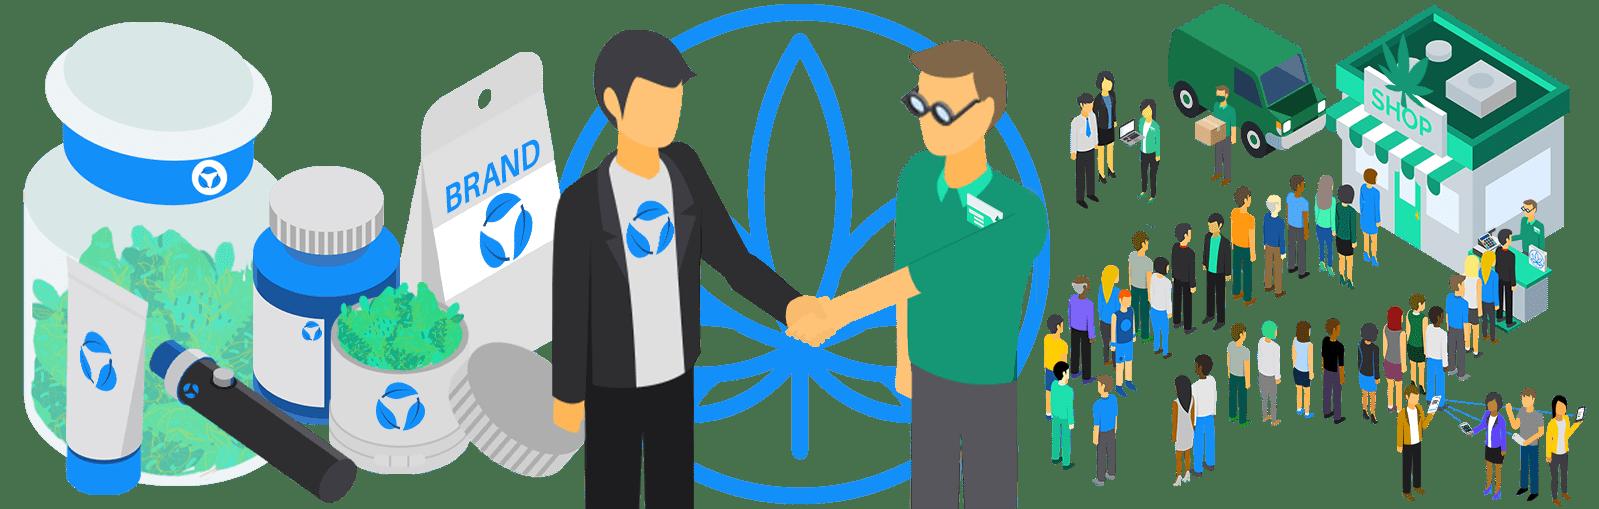 brand - retailer collaboration